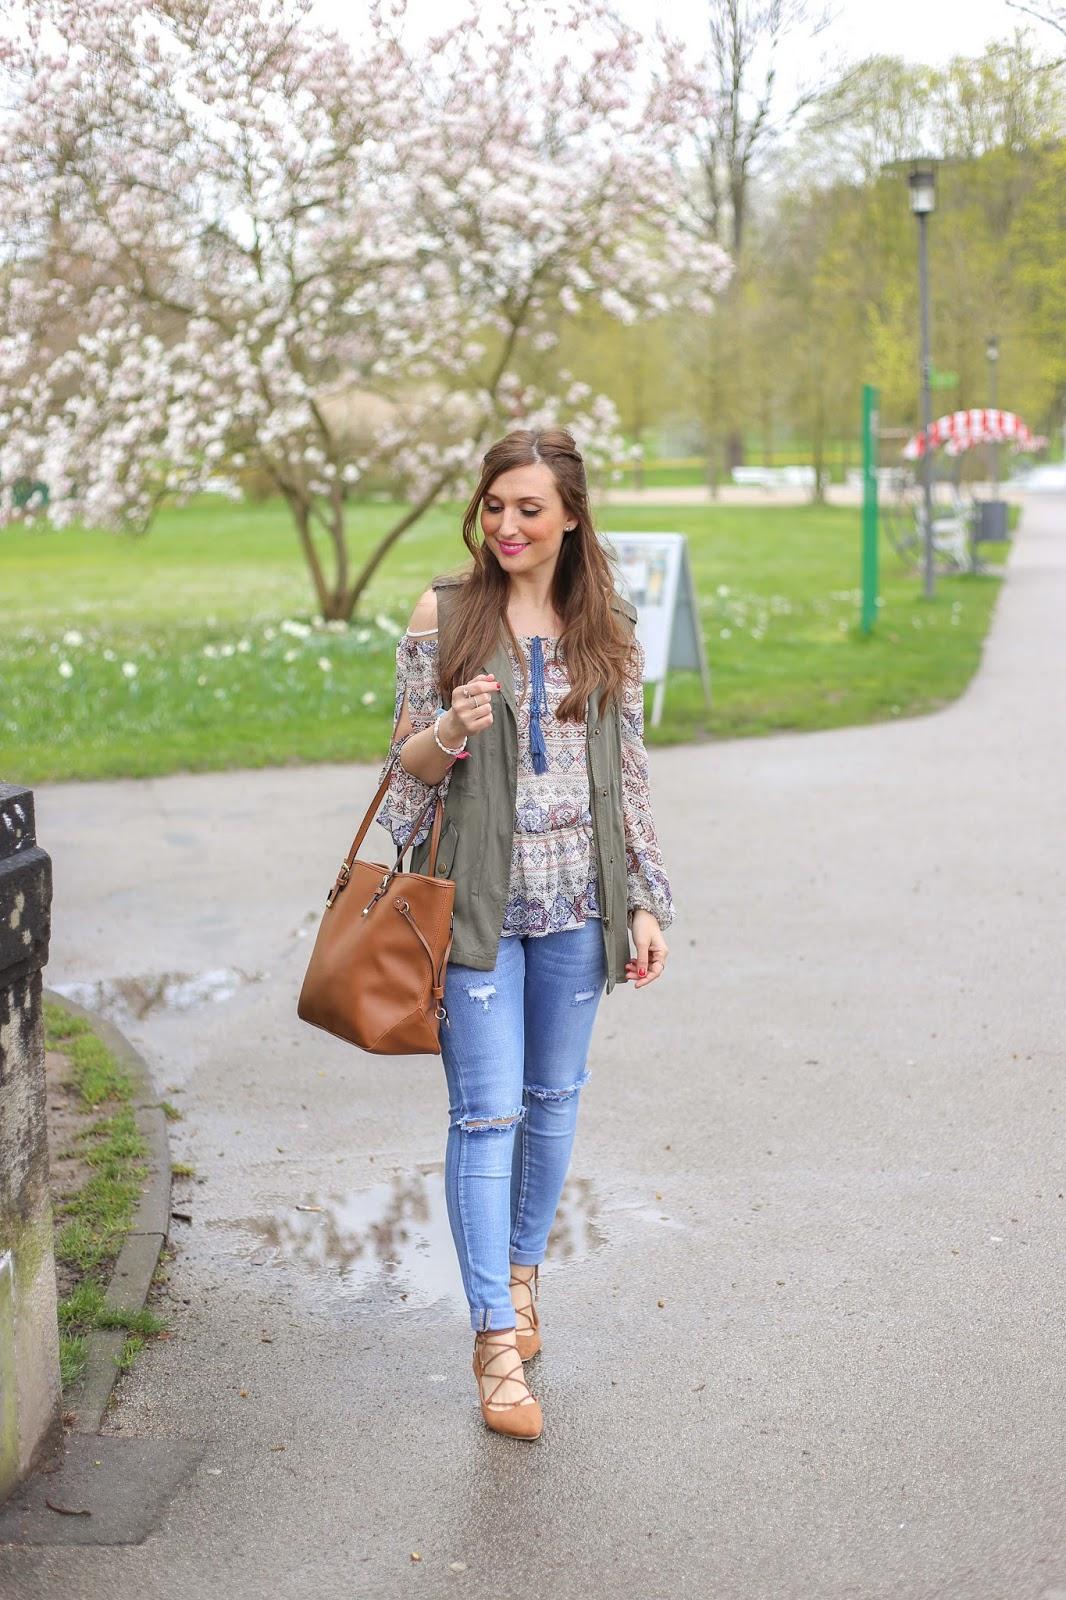 Beauty Blogger aus Frankfurt - StreetOne – Streetone Kleid - Fashionstylebyjohanna - Blogger im Kleid - Streetstyle - Blogger im Karokleid - Fashionblogger aus Deutschland - Deutsche Fashionblogger – Fashionblog – Blogger Streetstylelook